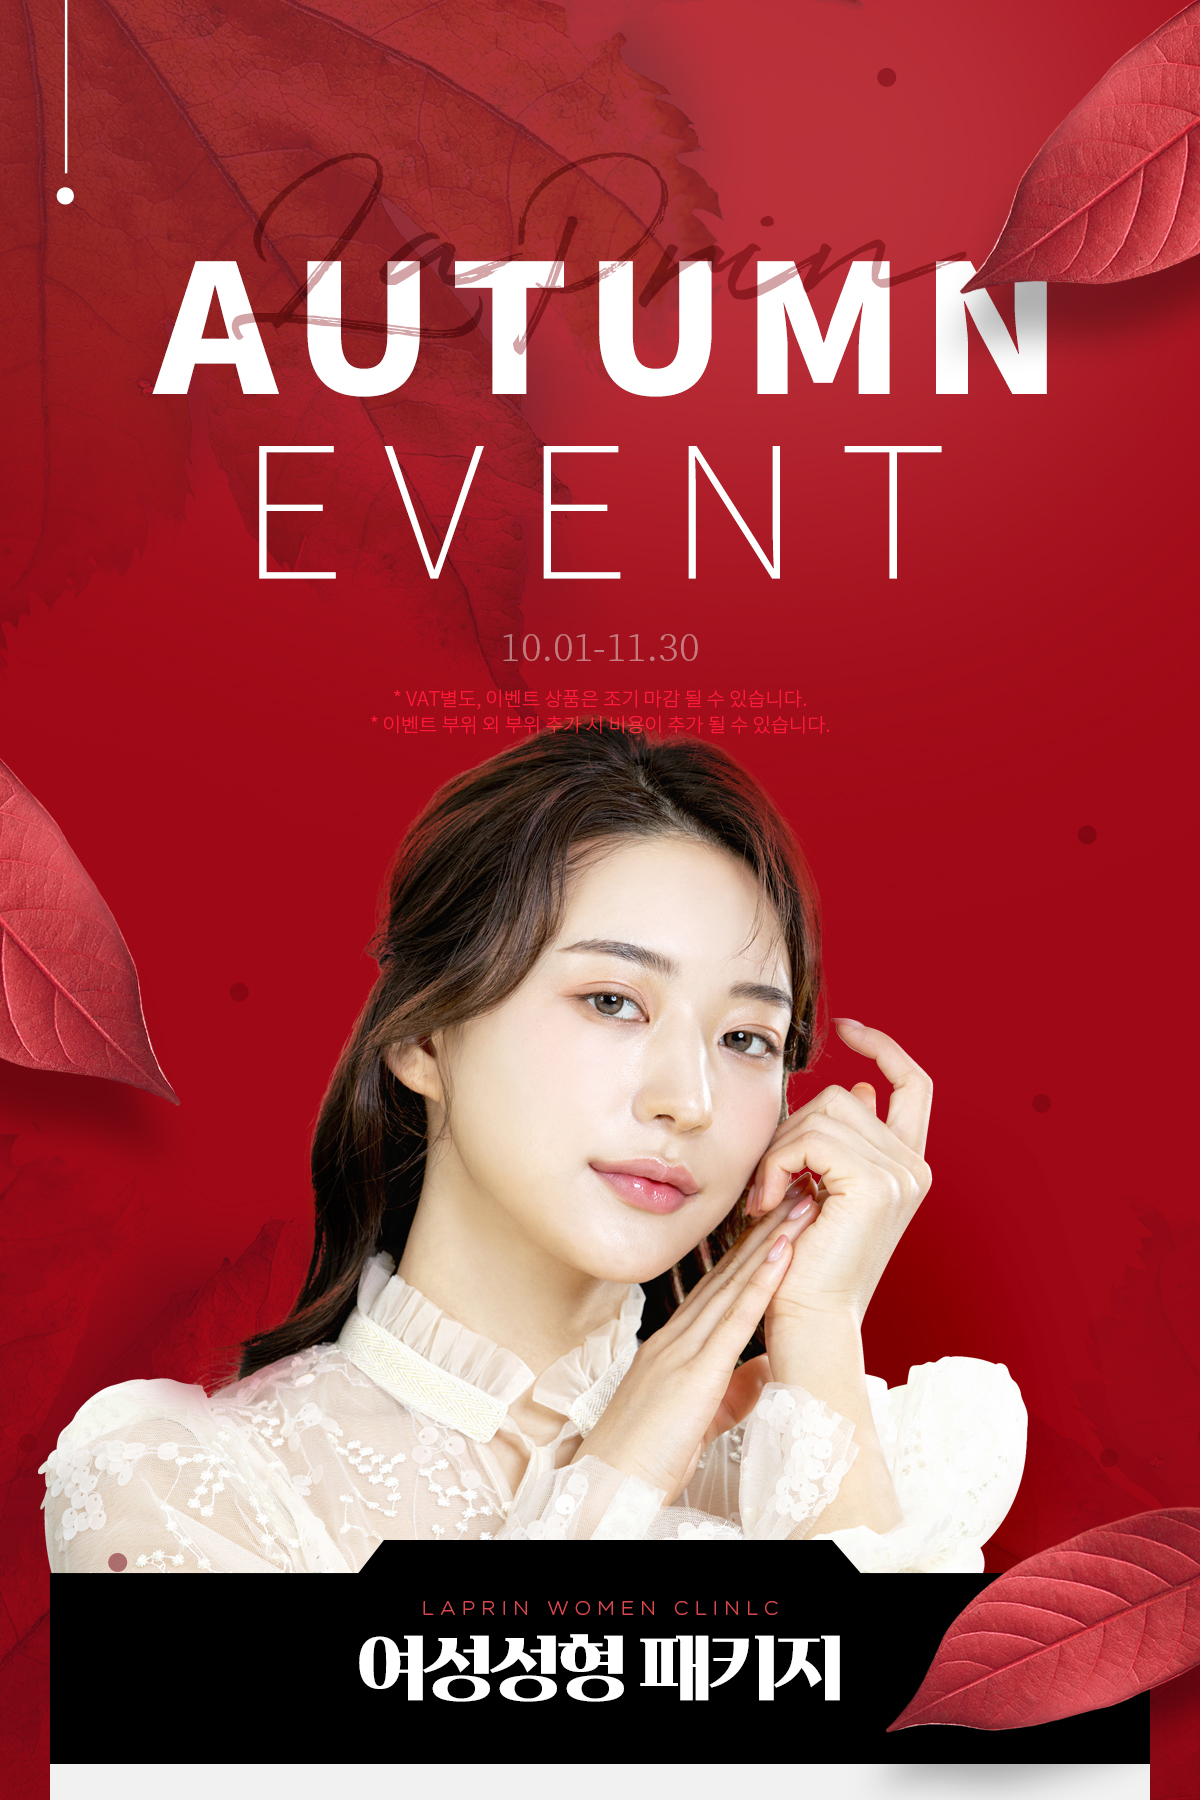 event0_7.jpg